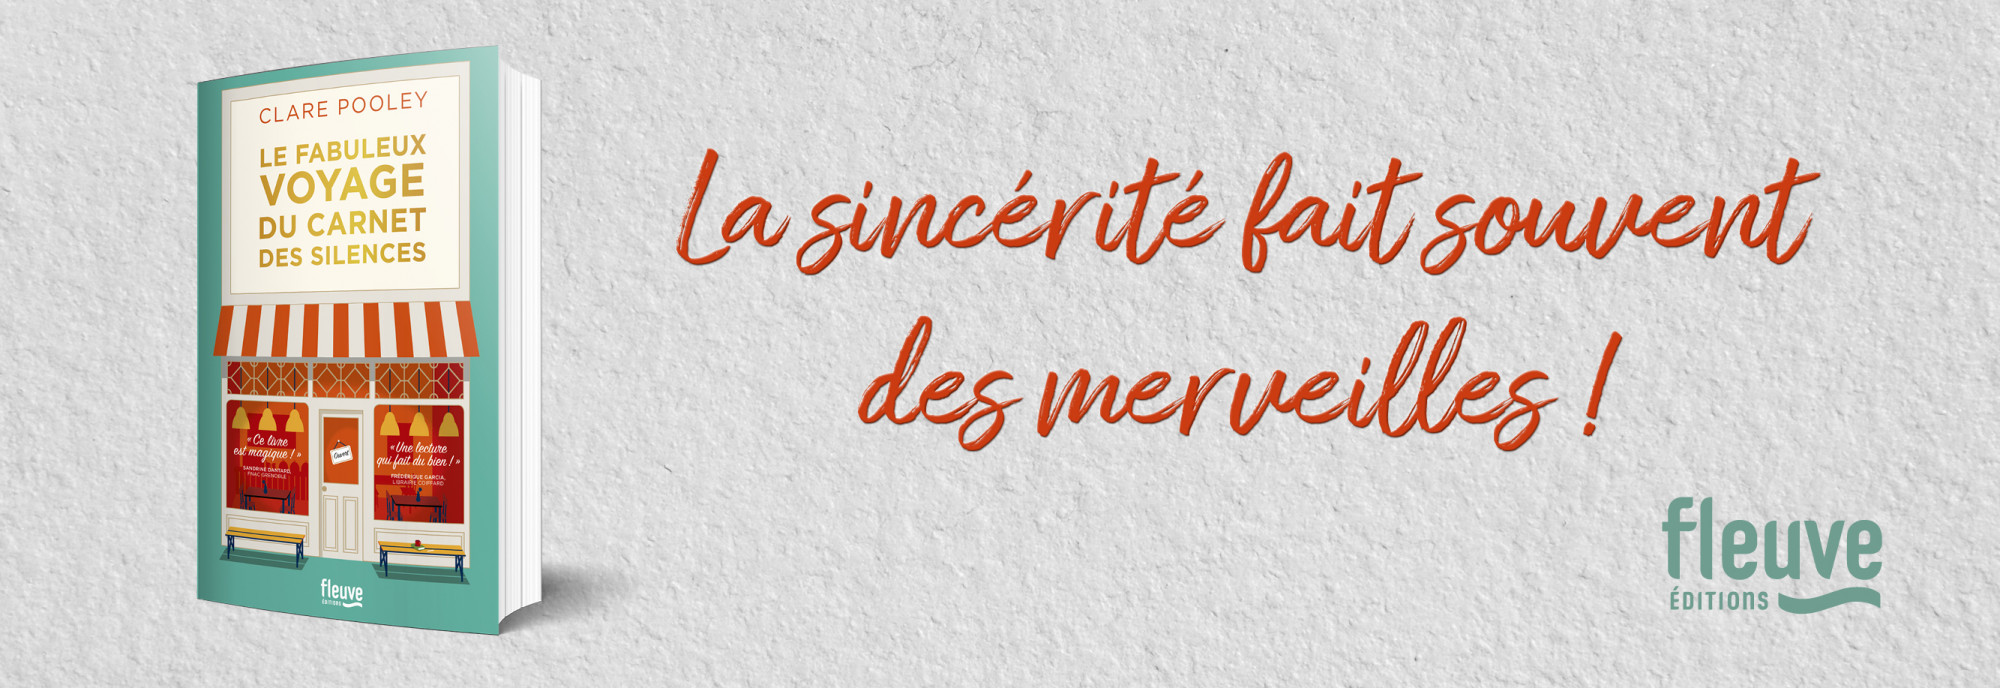 6403_1_Carnet_des_silences_-_1280x440.jpg